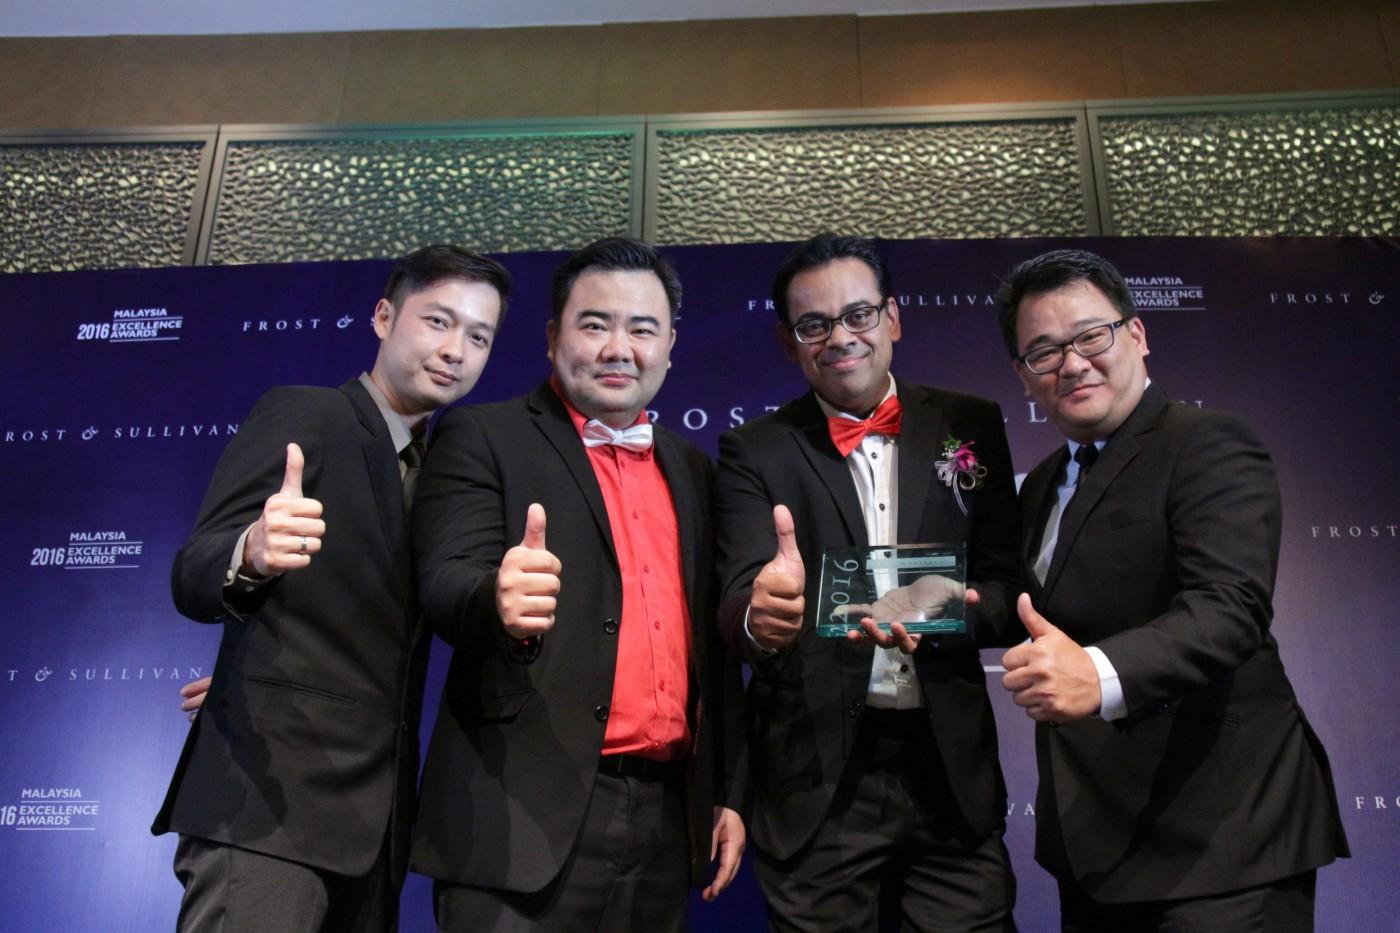 Low Han Ben (Head of Sales, redONE); Ben Teh (CSO, redONE); Ameen Abdullah (CEO, redONE); Tee Yew Yaw (COO, redONE)